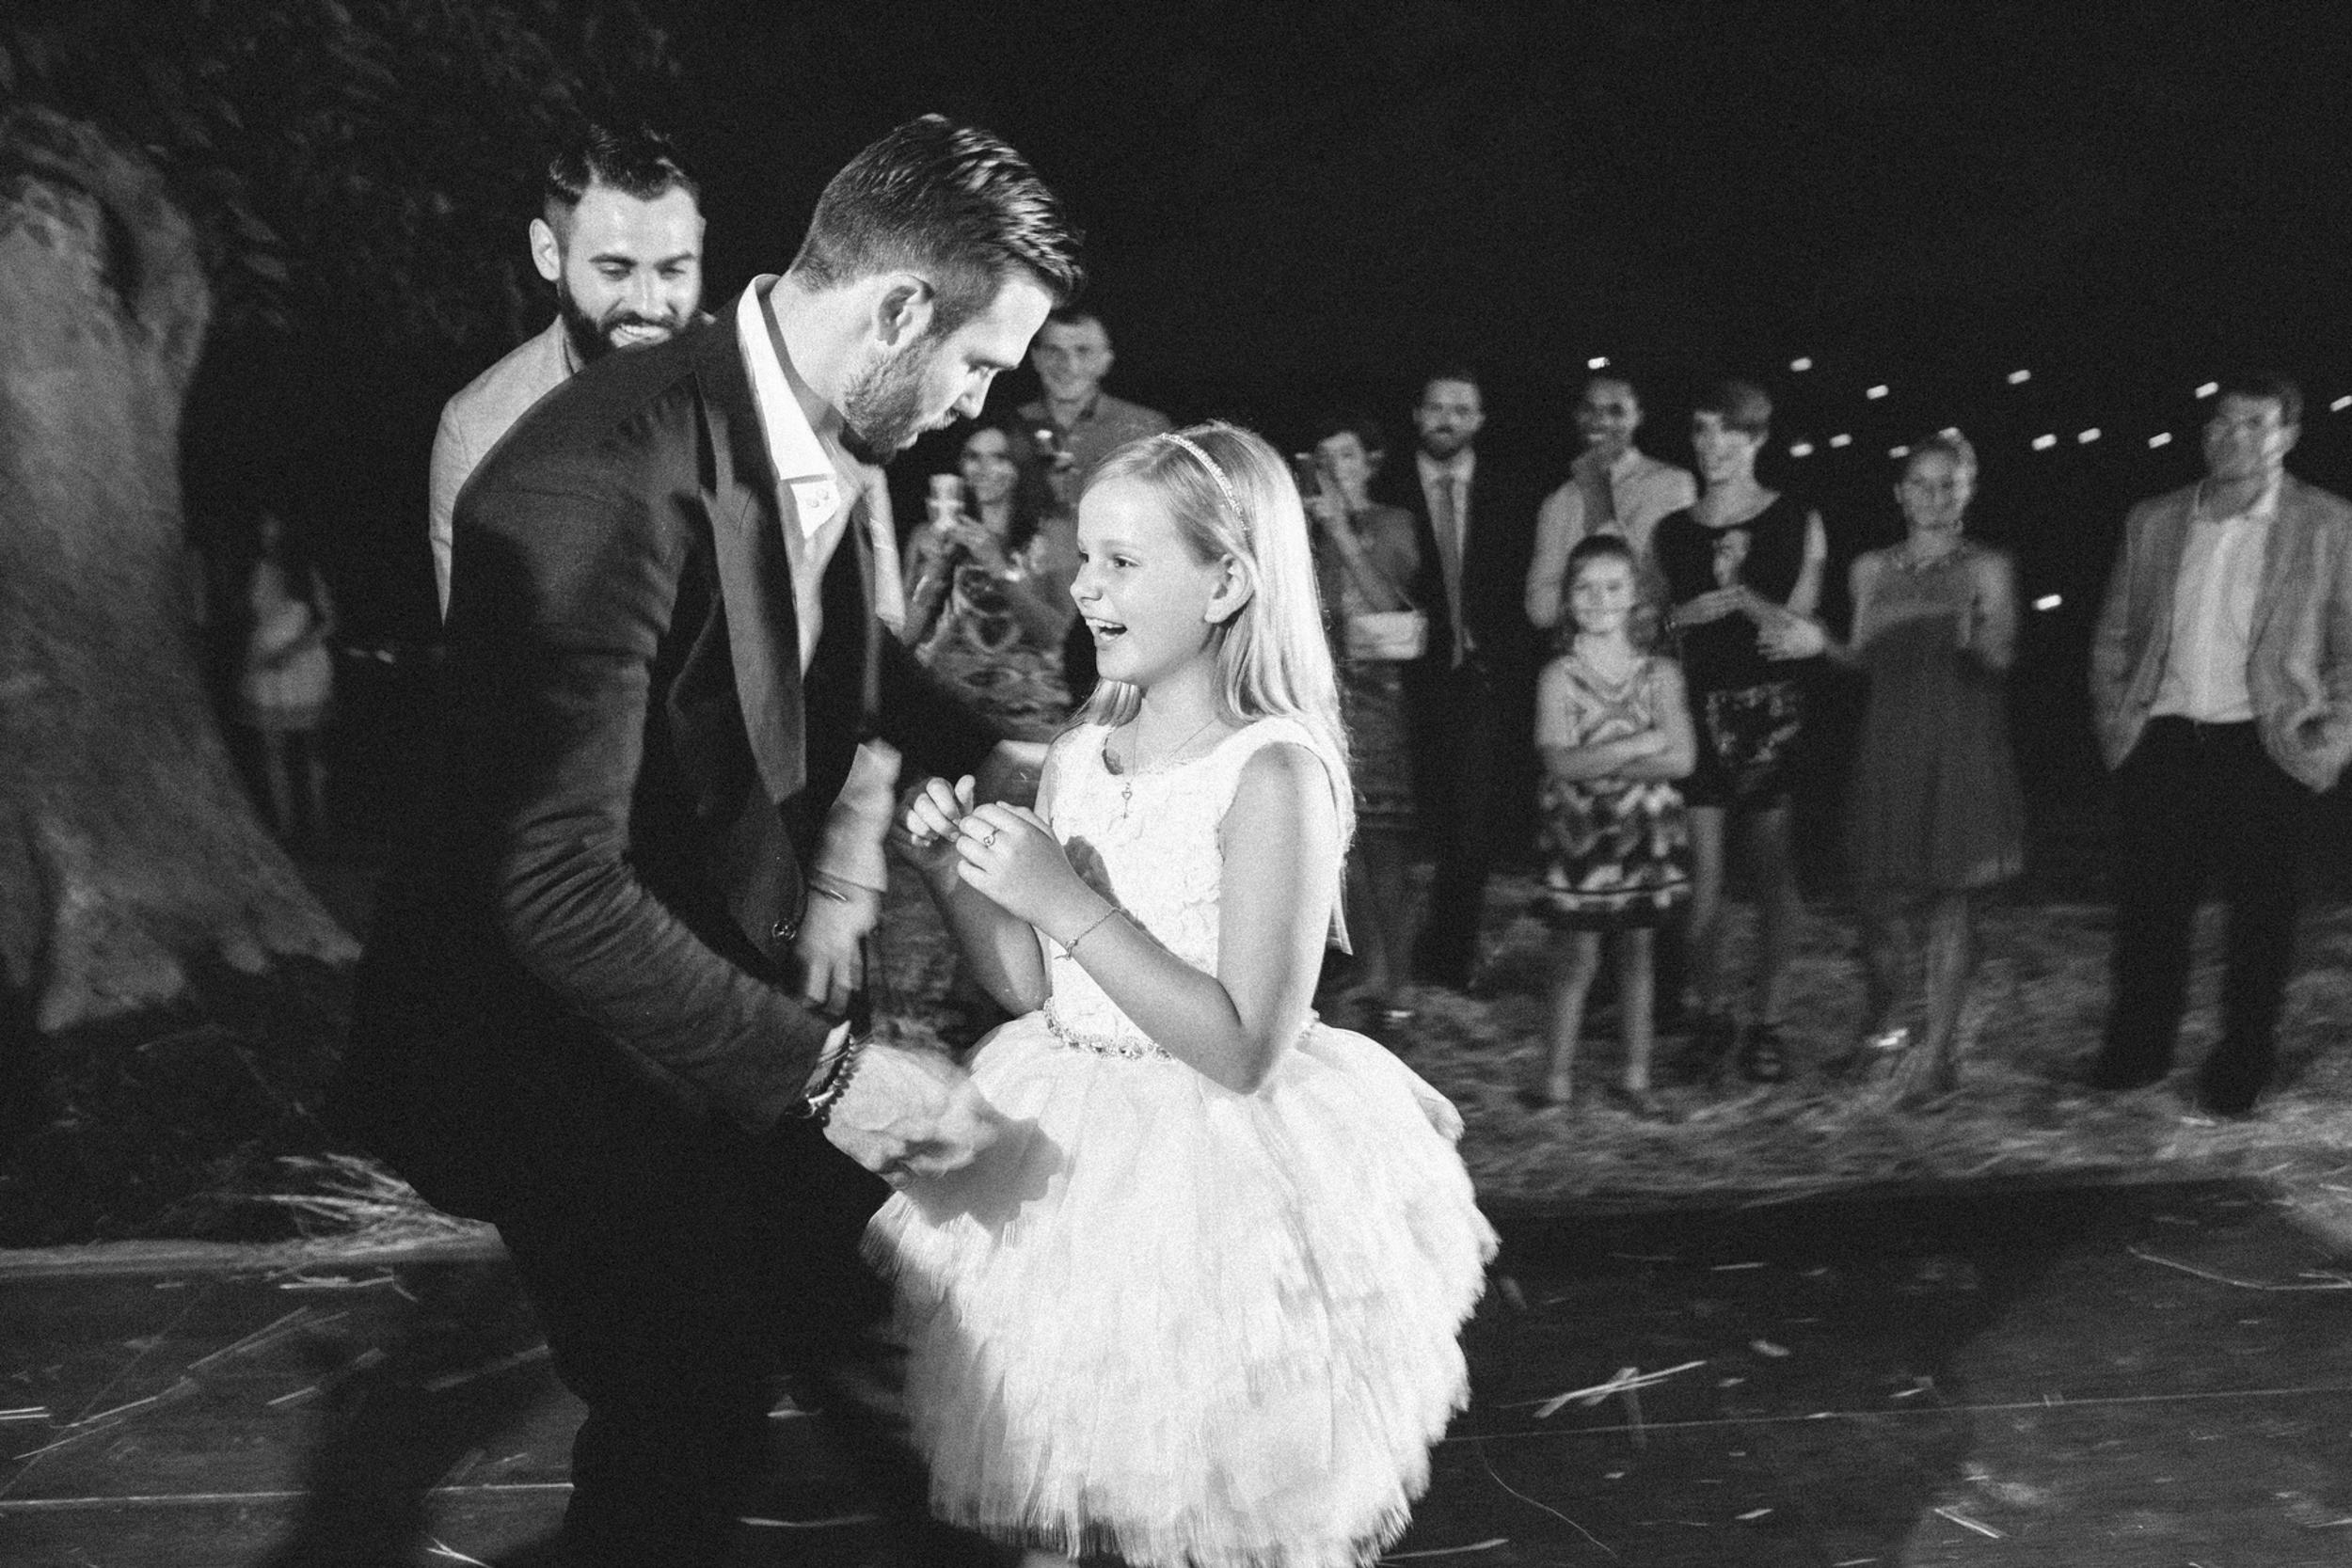 south_carolina_farm_wedding_rustic_chic_surprise_secret_luxe_wedding_bachelorette_emily_maynard_real_weddings-51.jpg